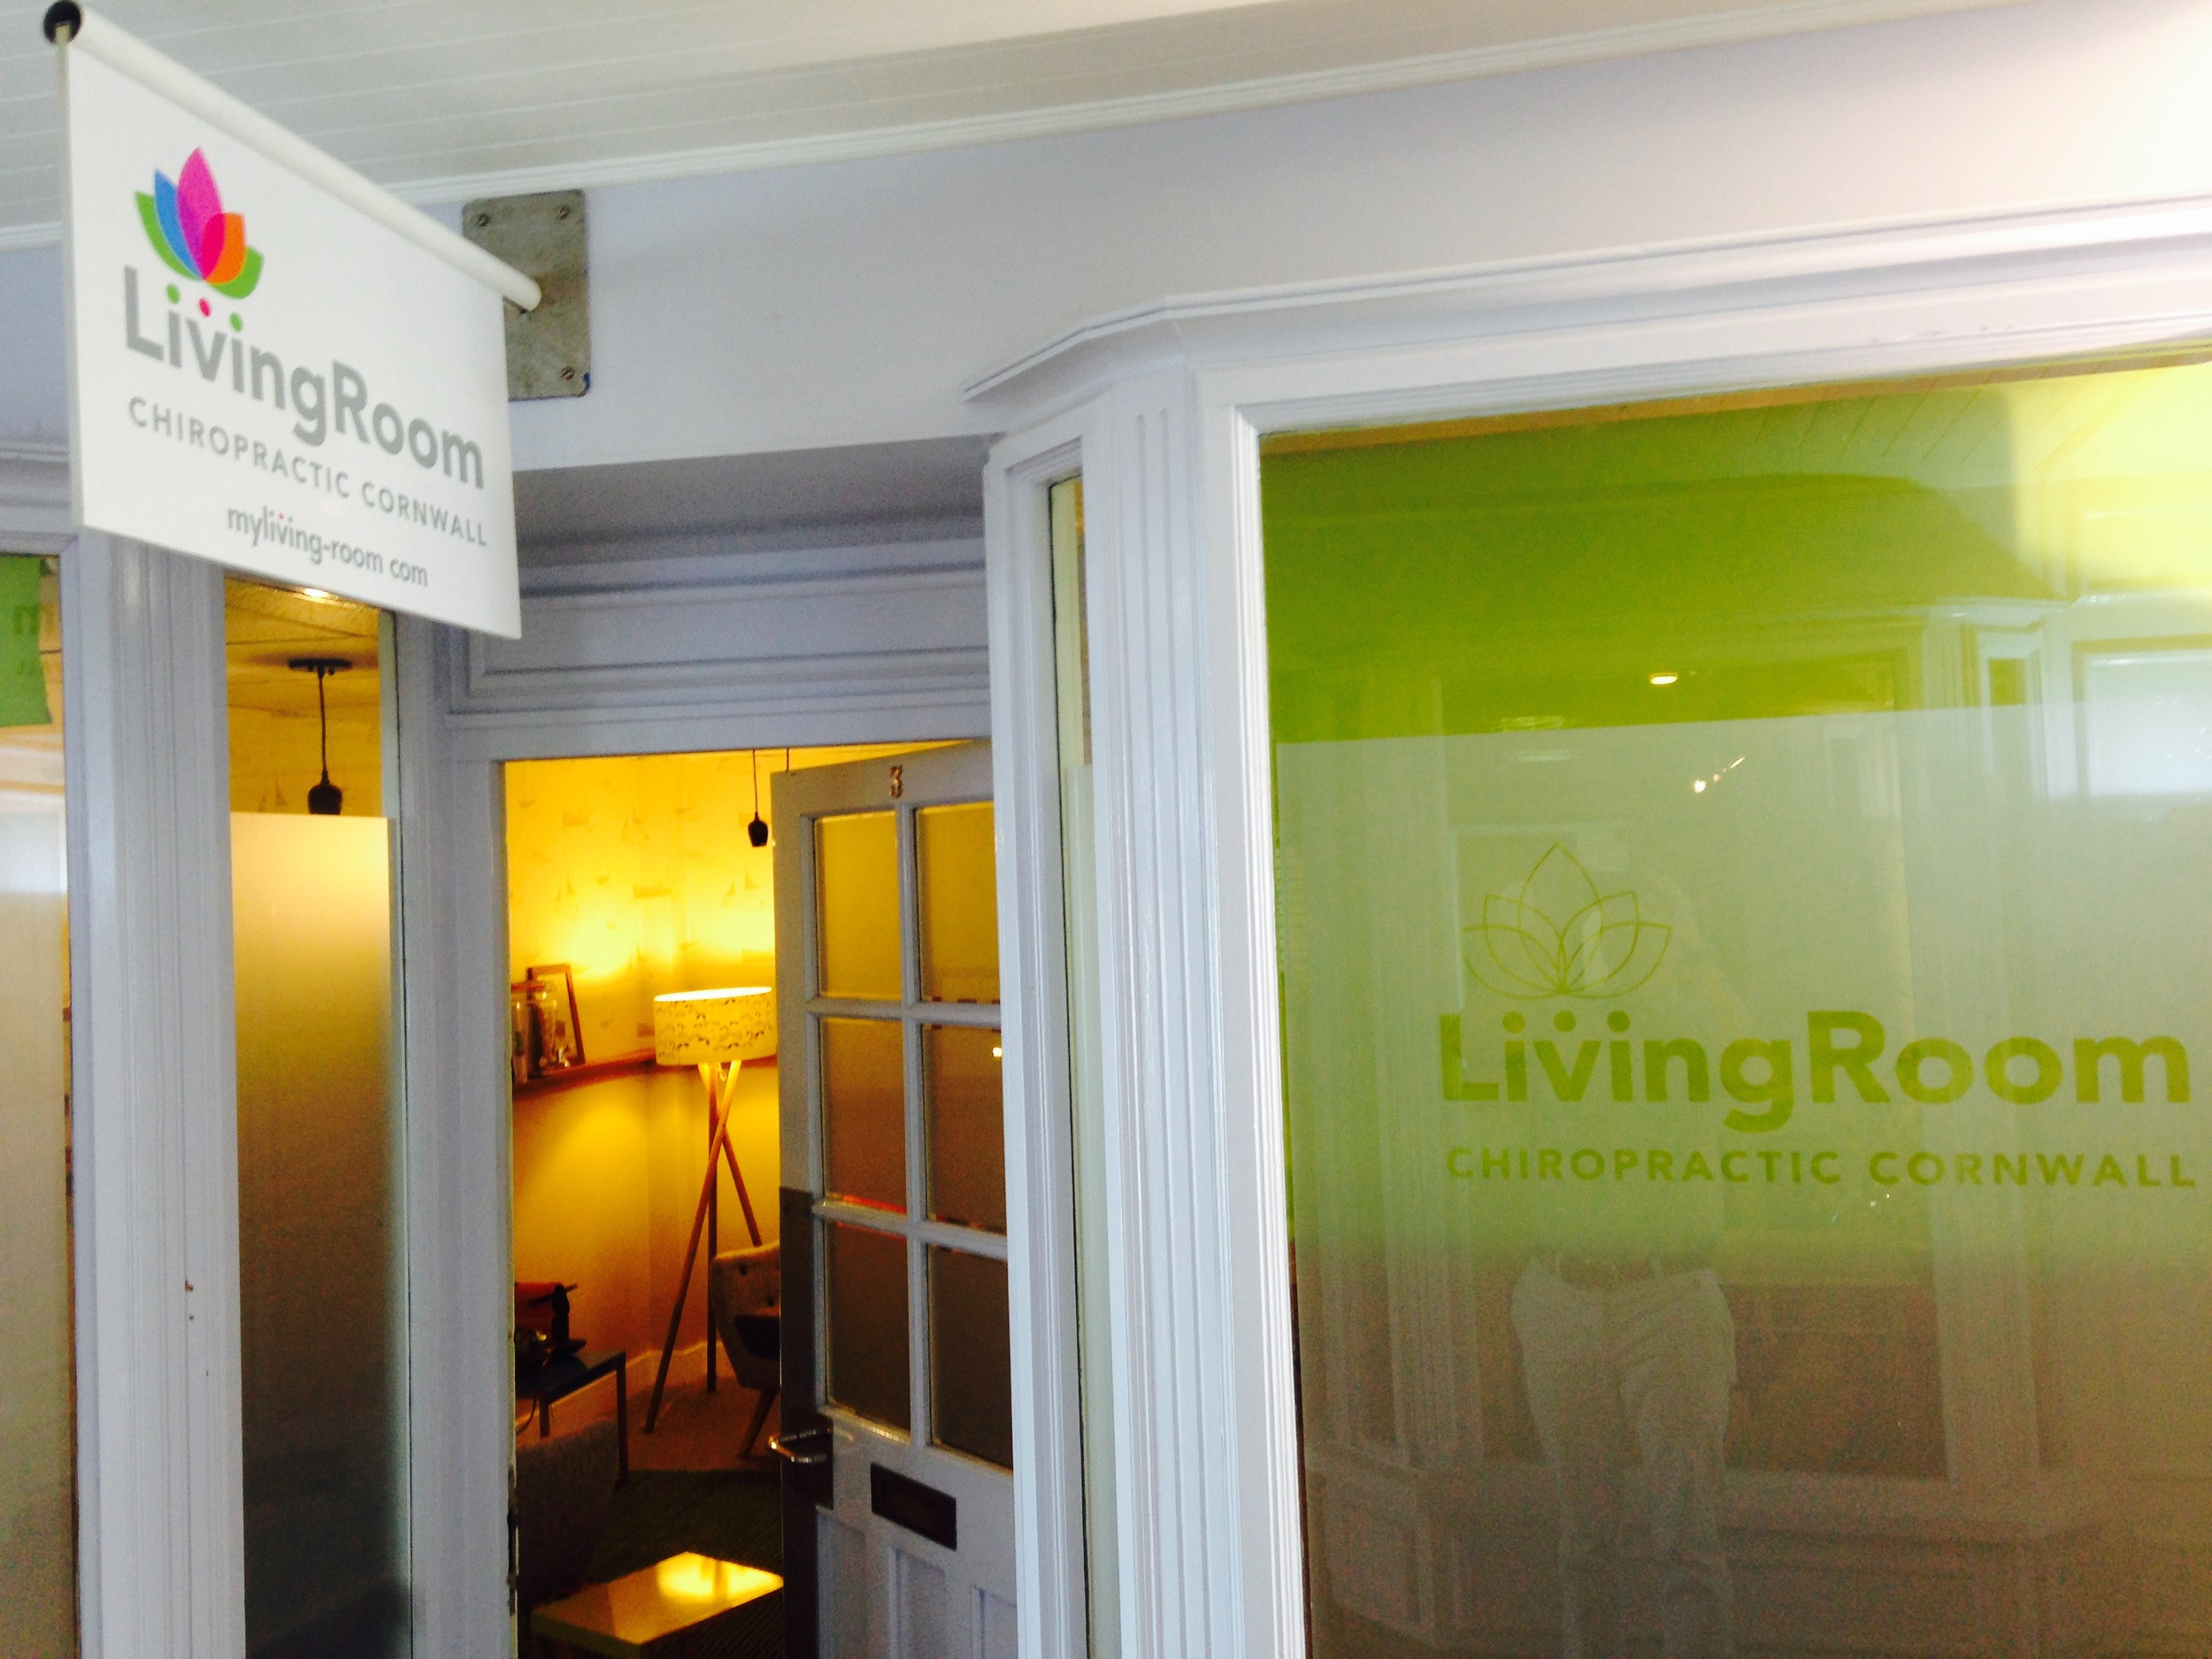 LivingRoom Open for Adjustments